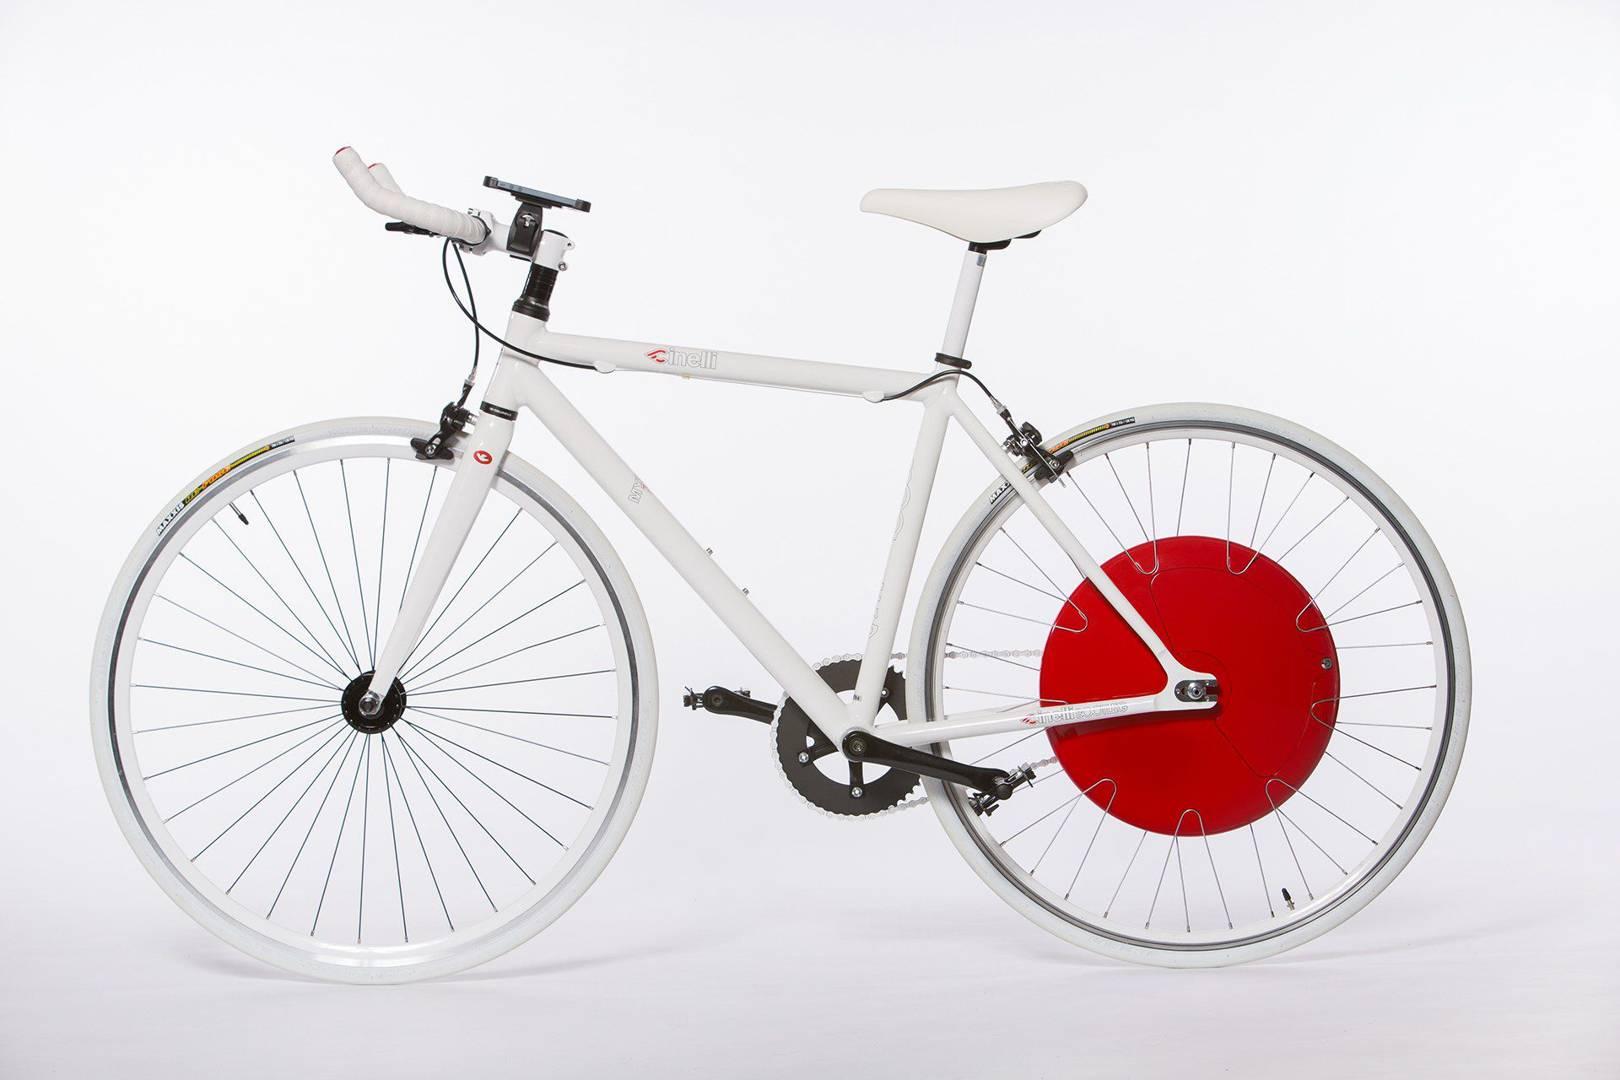 The Nike Fuel Of Cycling Copenhagen Wheel Turns Your Bike Into A